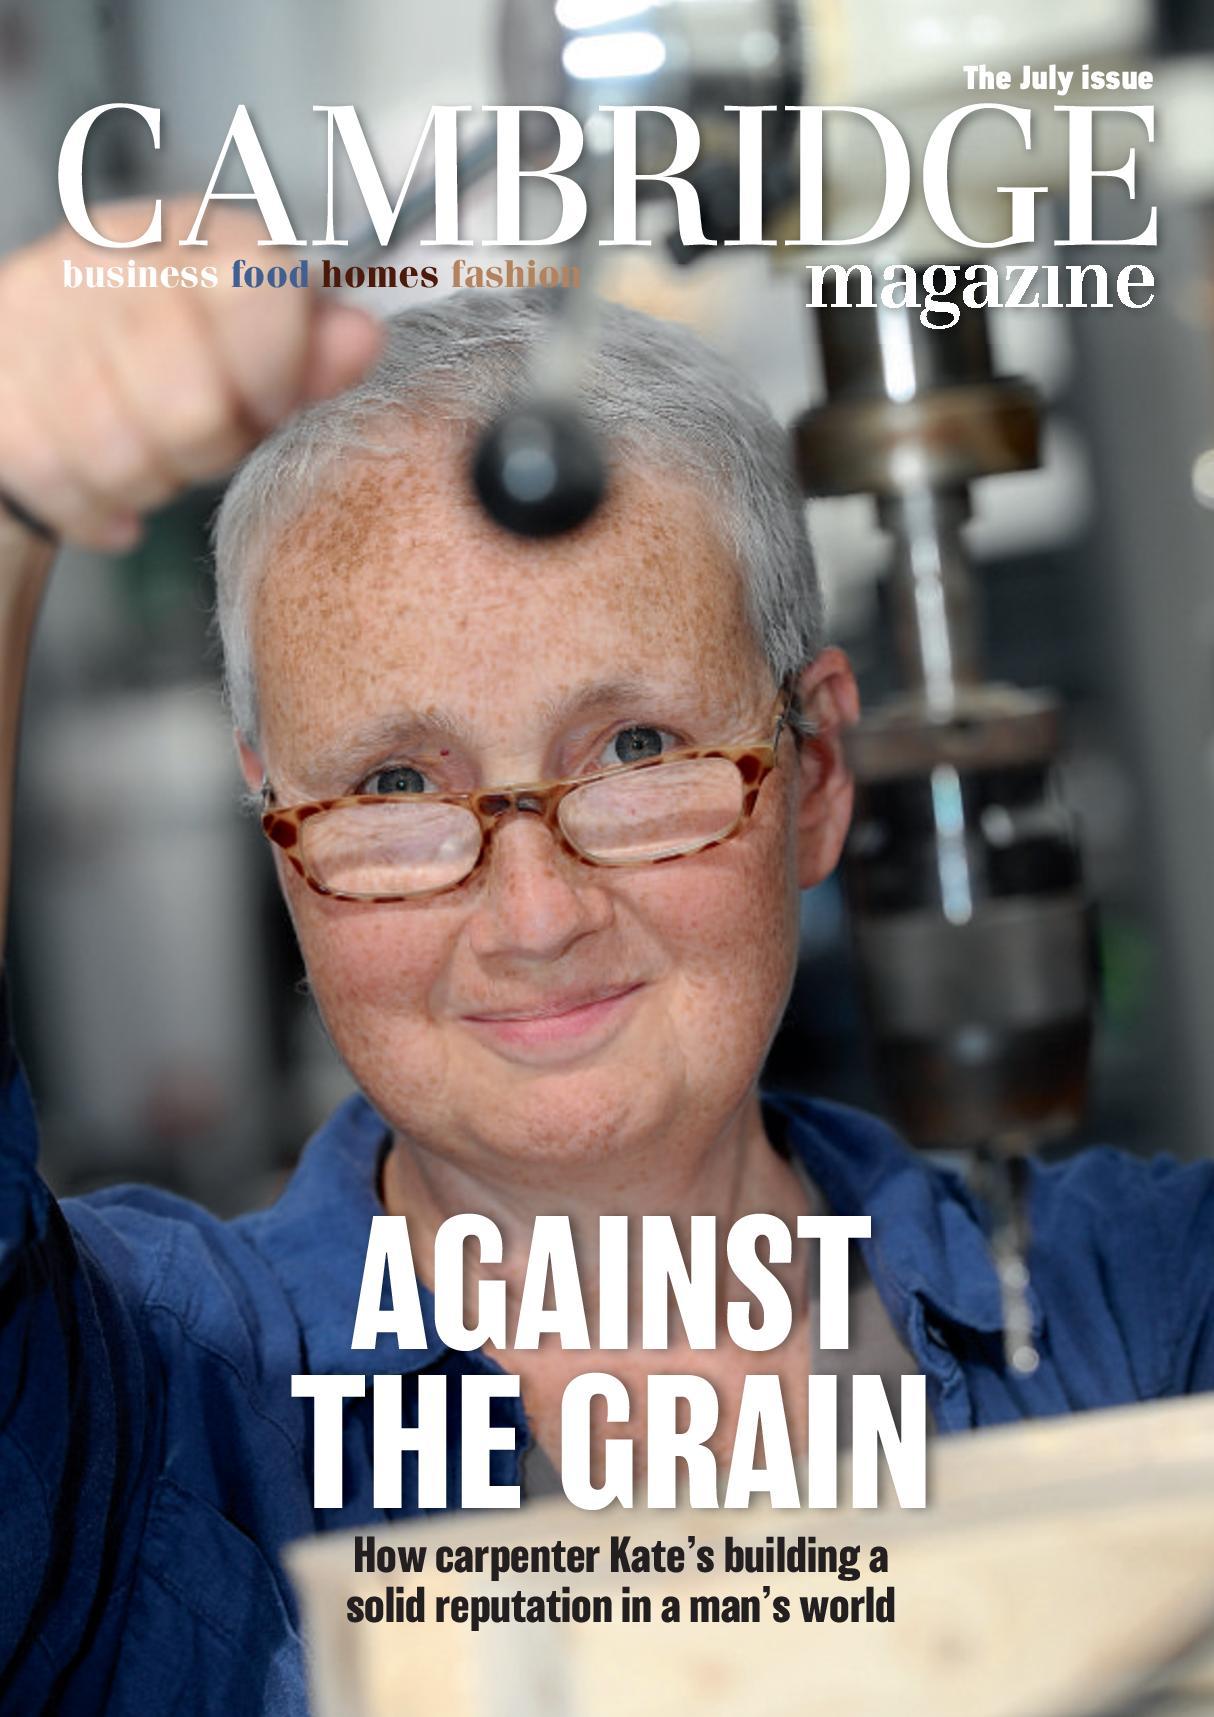 Grand Designs - Cambridge Magazine July Issue-page-001.jpg